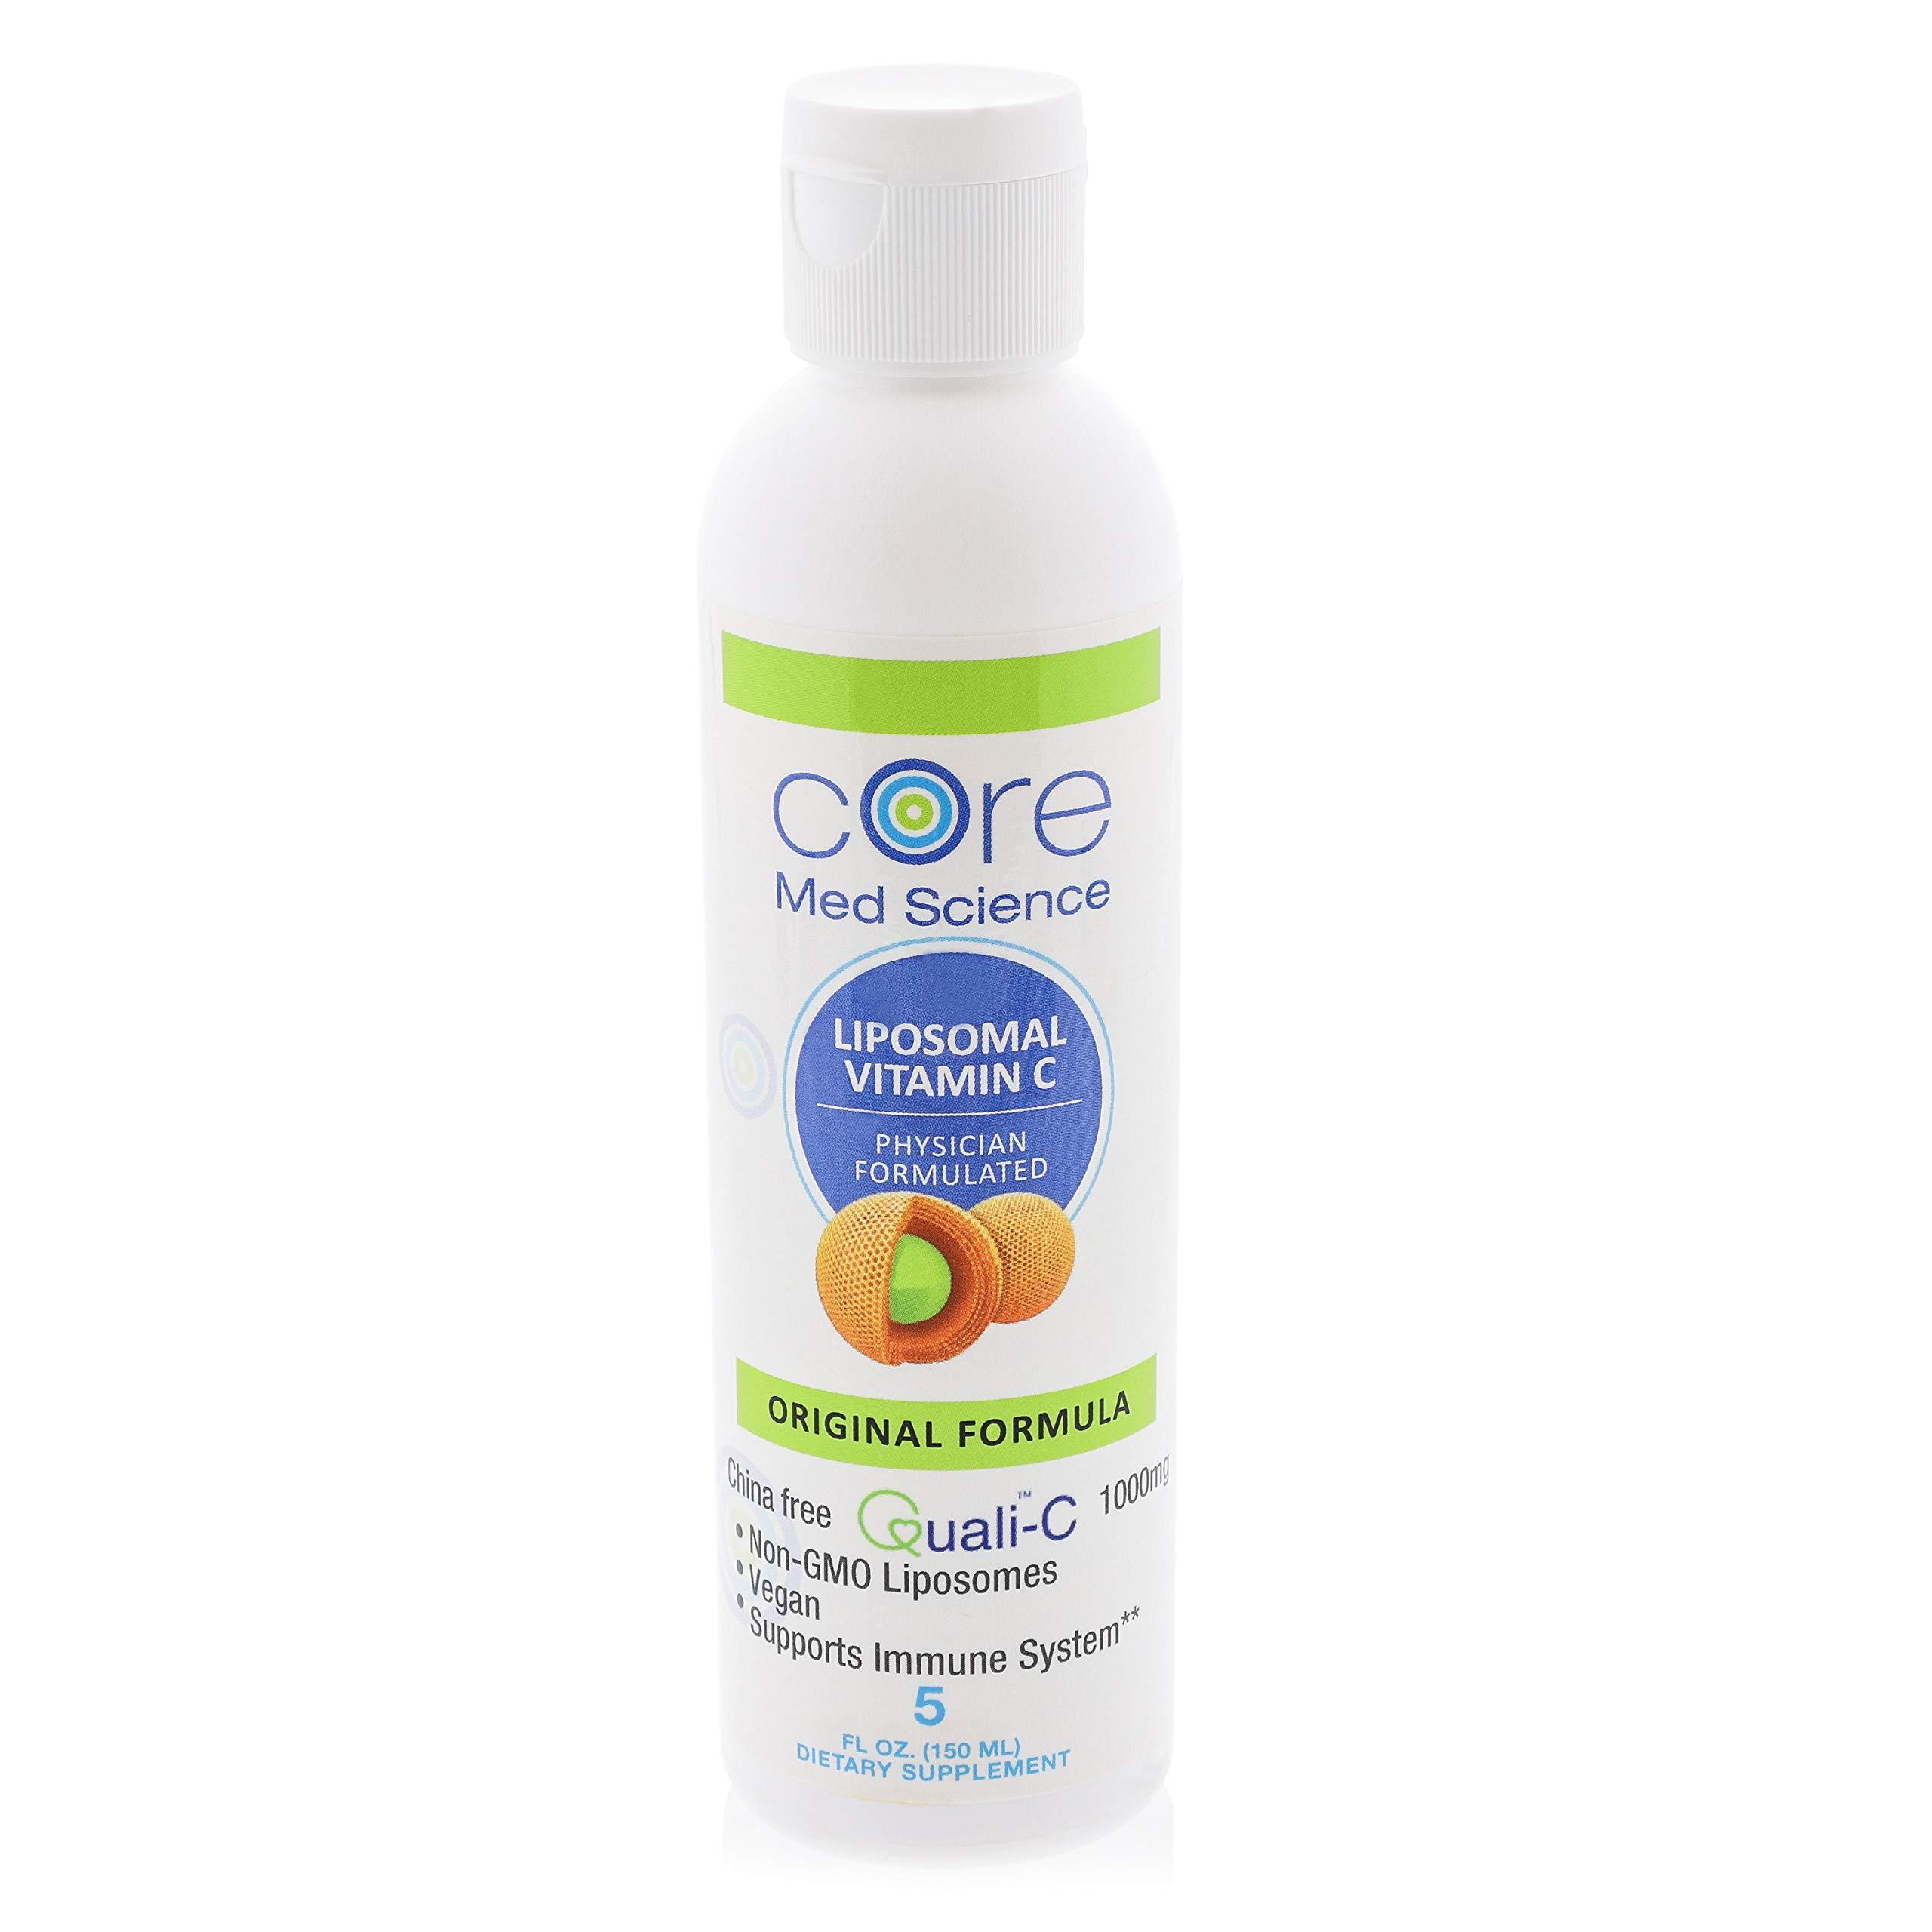 Optimized Liposomal Vitamin C 1000 mg Liquid | Original Orange Formula | Quali®-C Scottish Ascorbic Acid | China-Free| Highest Absorption | Immune Support | Non-GMO, Vegan, Organic 30 Servings